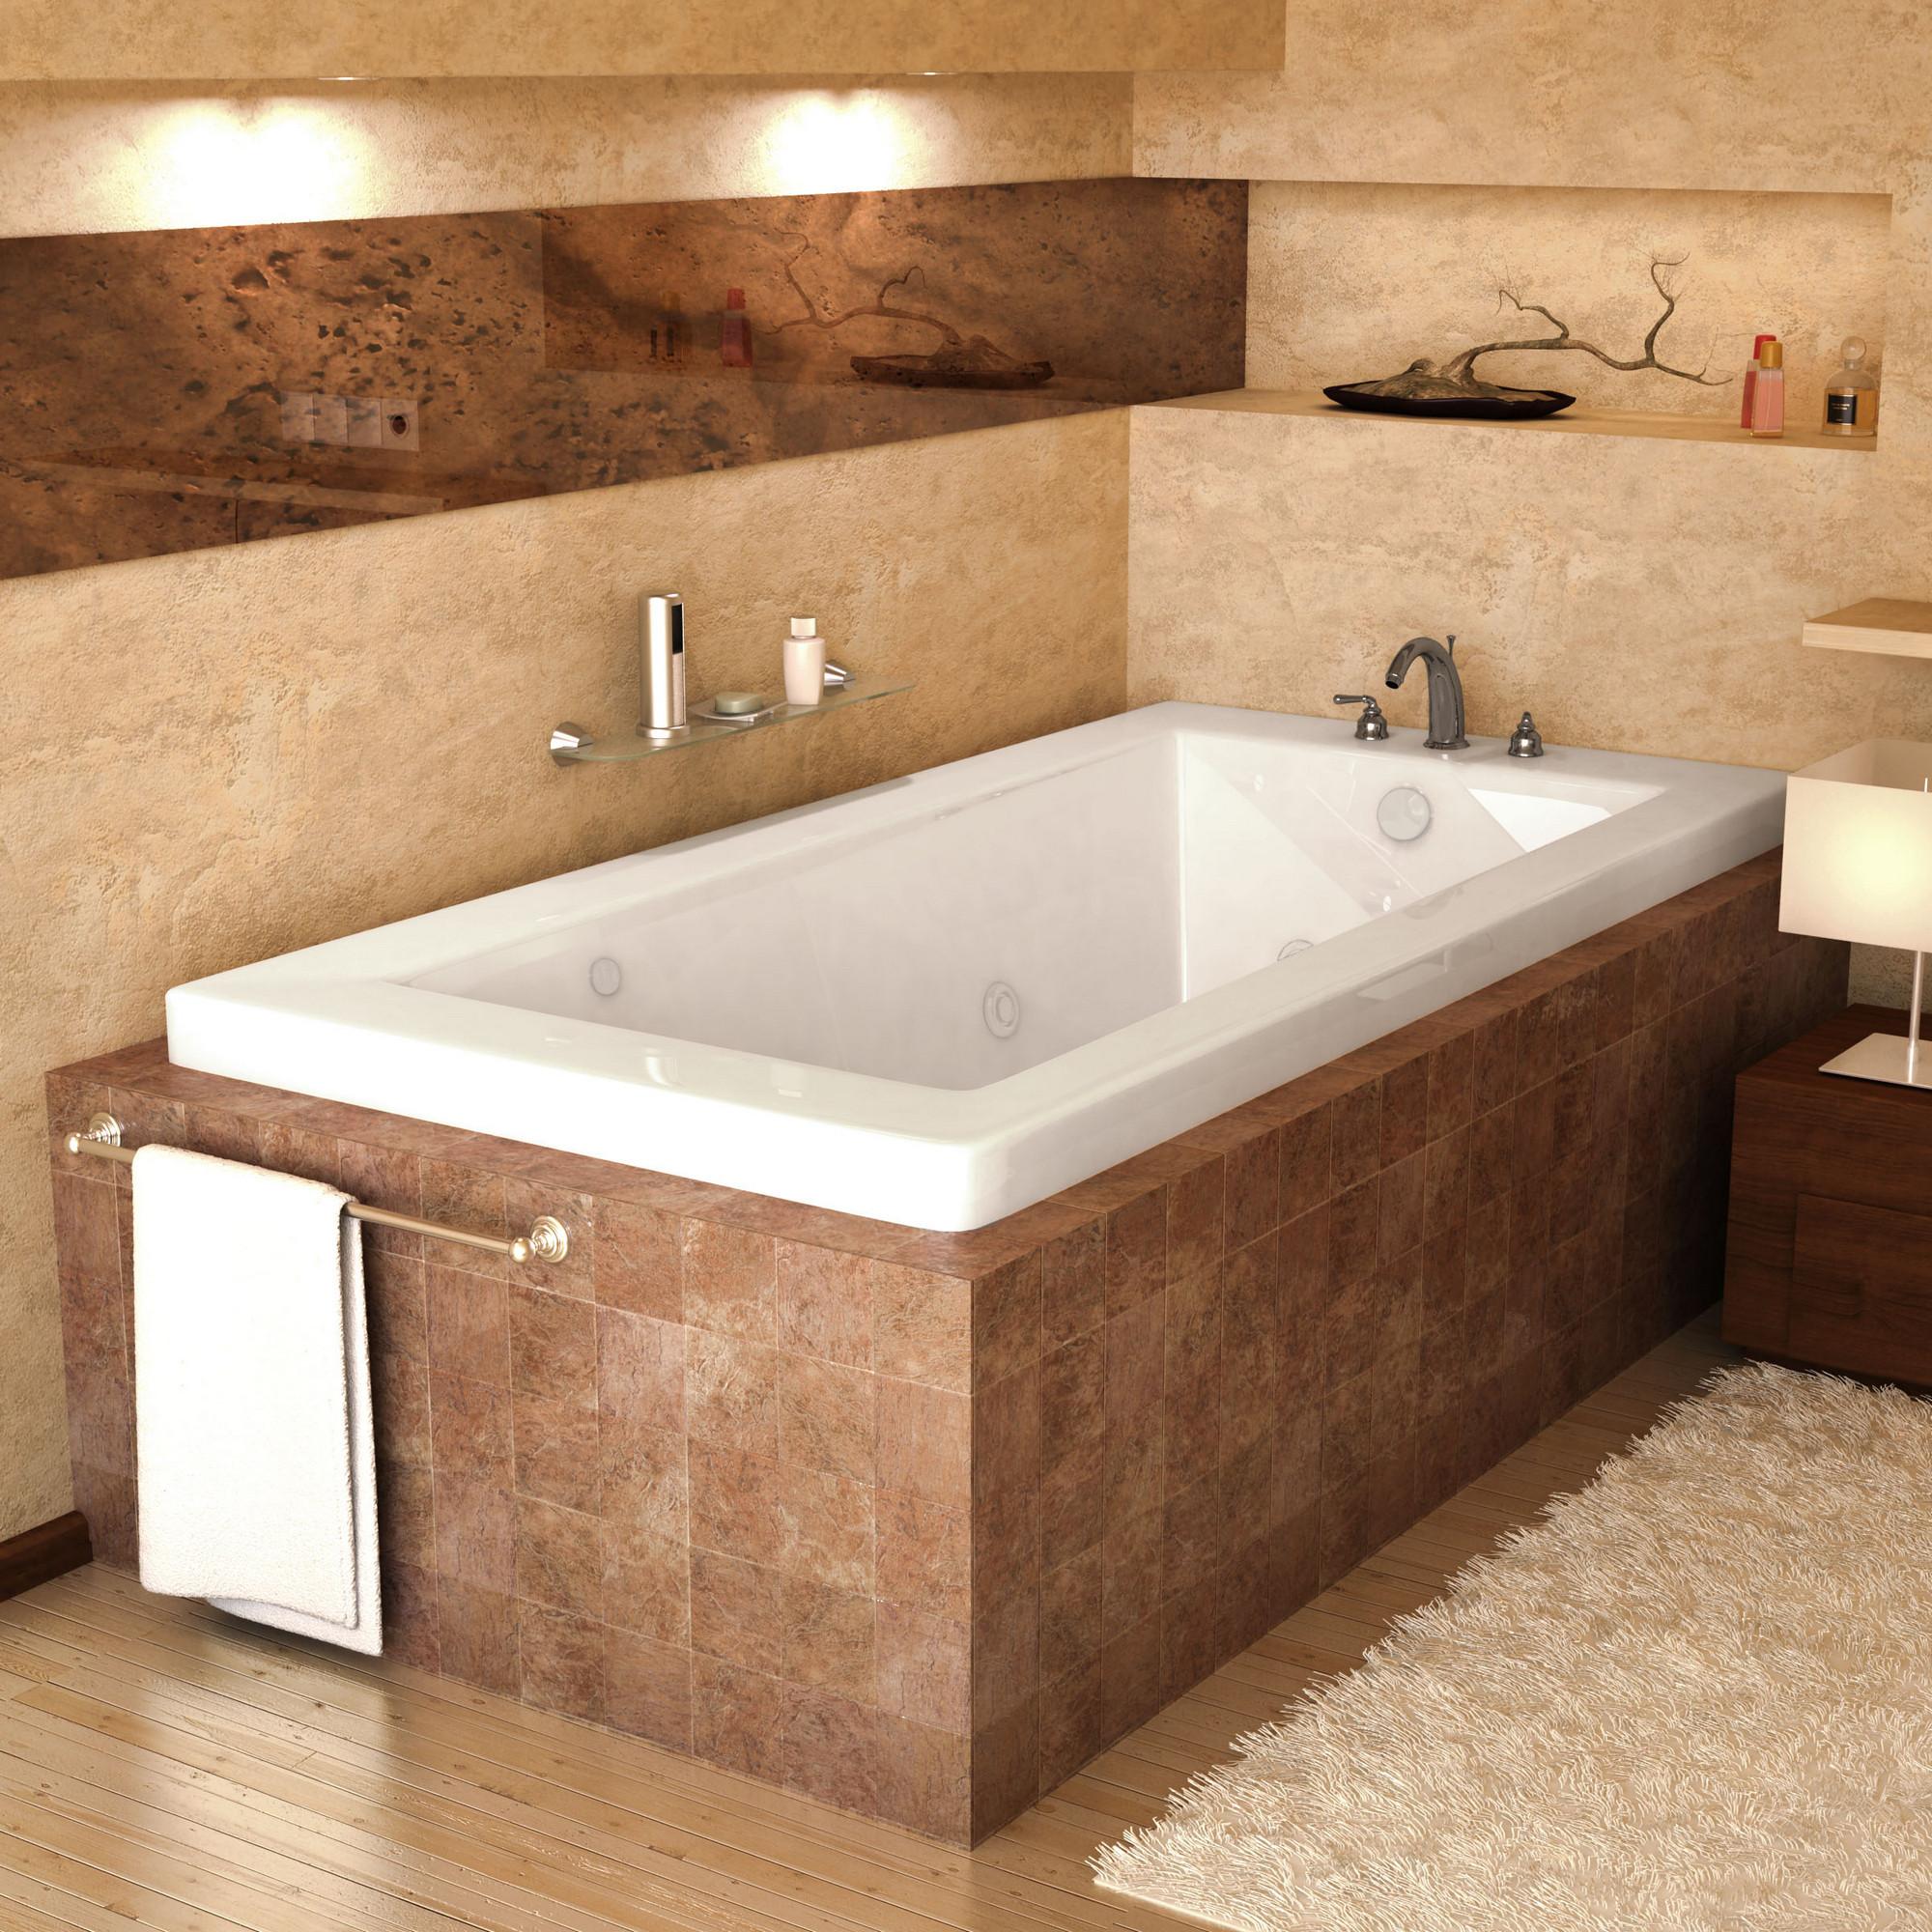 MediTub 3060VNDL Atlantis Venetian Air & Whirlpool Bathtub With Left Drain